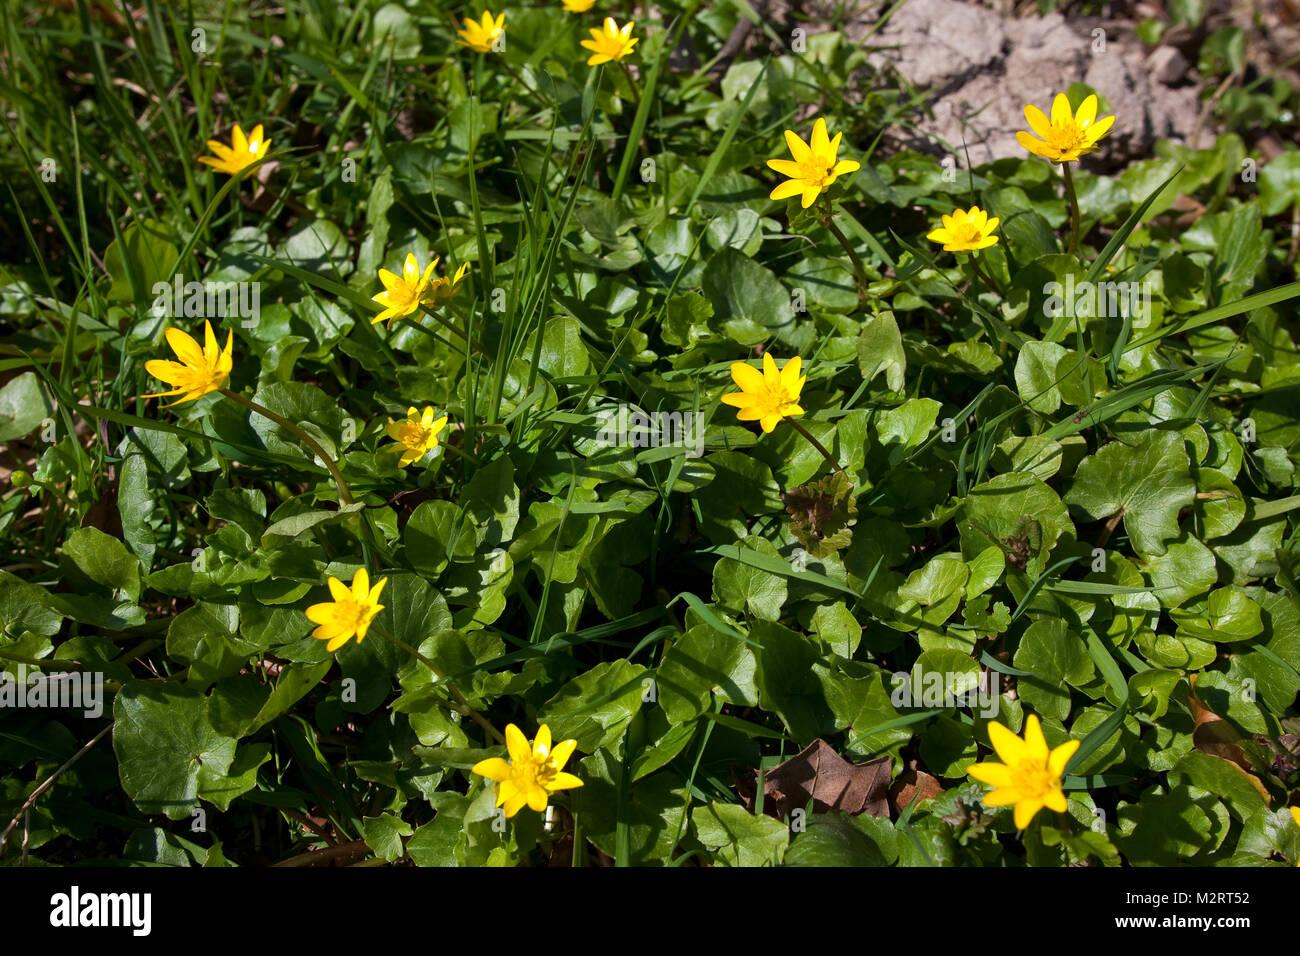 Scharbockskraut, Scharbocks-Kraut, Frühlings-Scharbockkraut, Ranunculus ficaria, Ficaria verna, Lesser Celandine, Immagini Stock